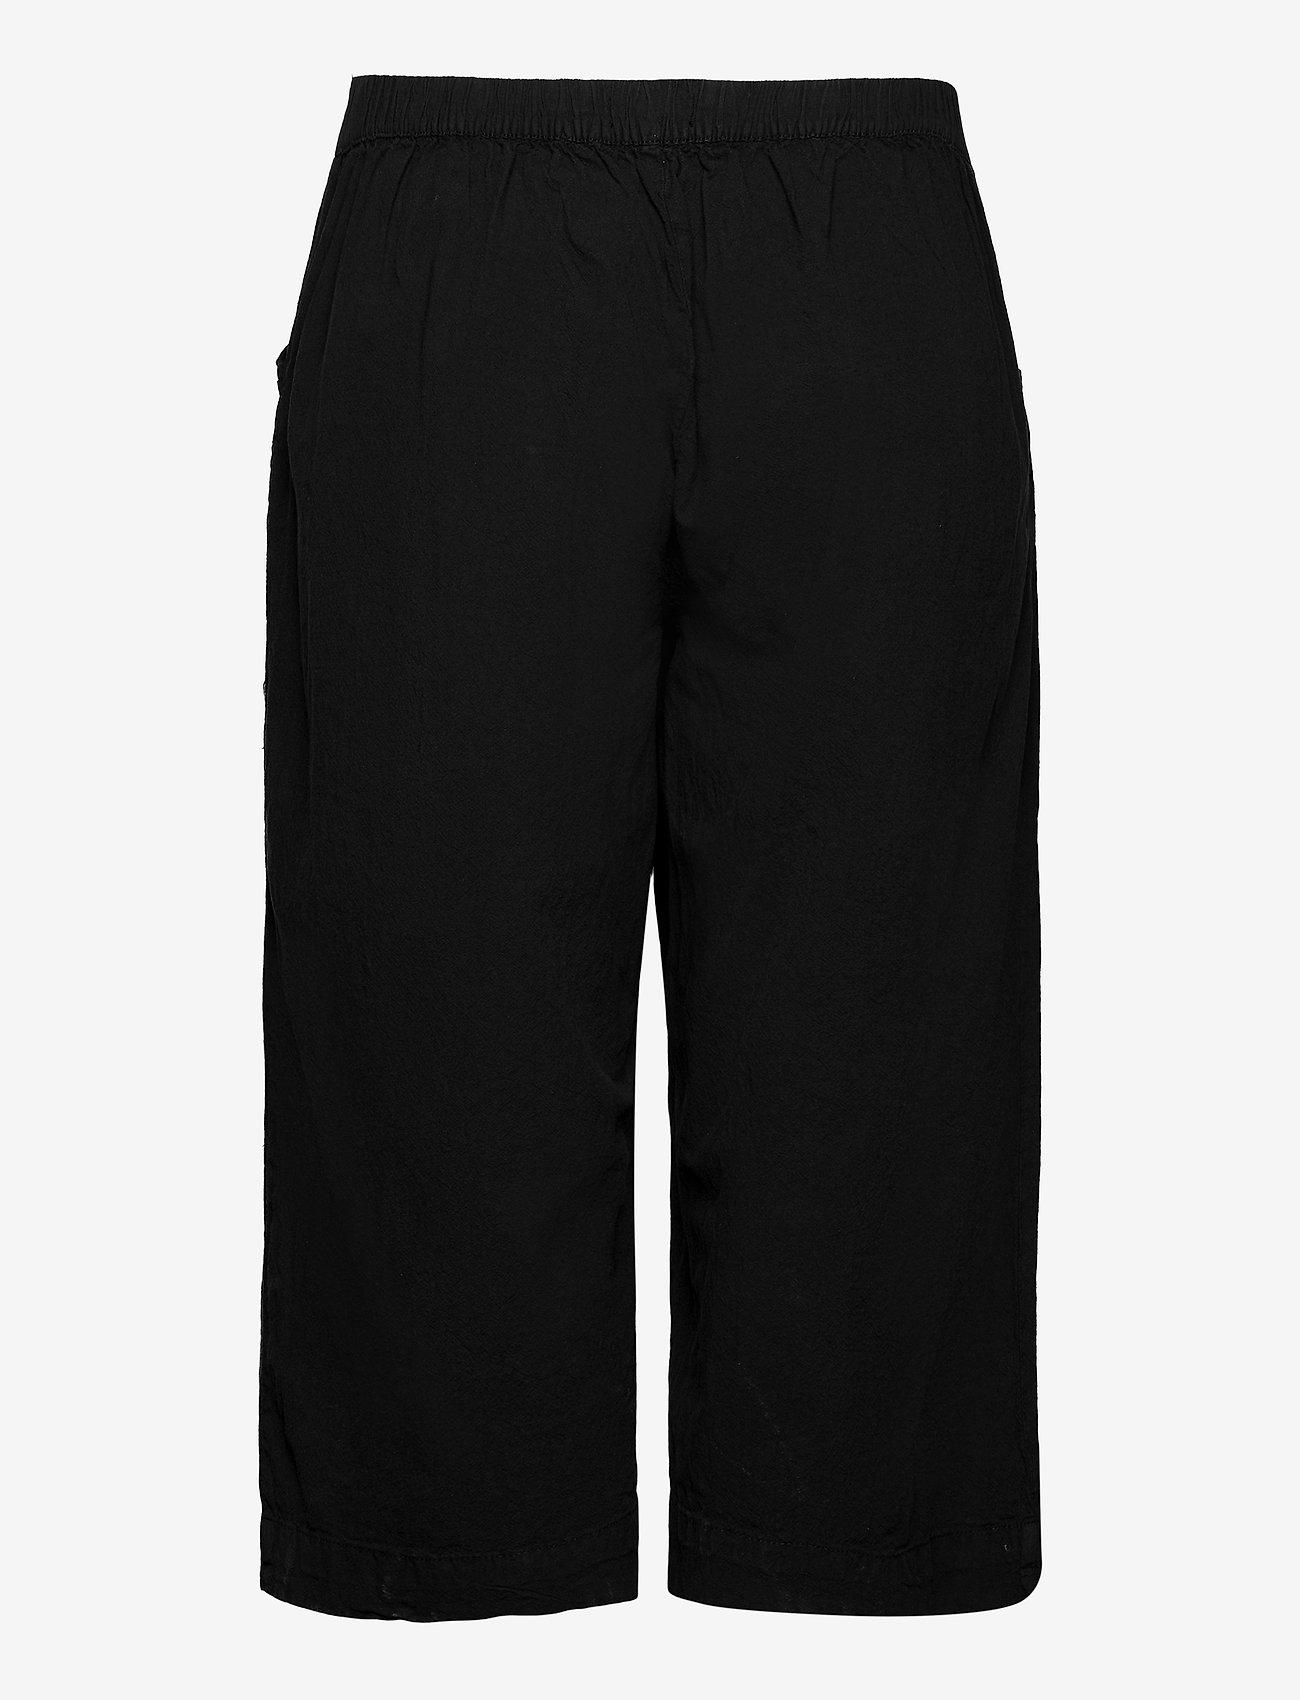 Zizzi - Trousers Culotte Plus Size Loose Fit Elastic Waistband - bukser med brede ben - black - 1